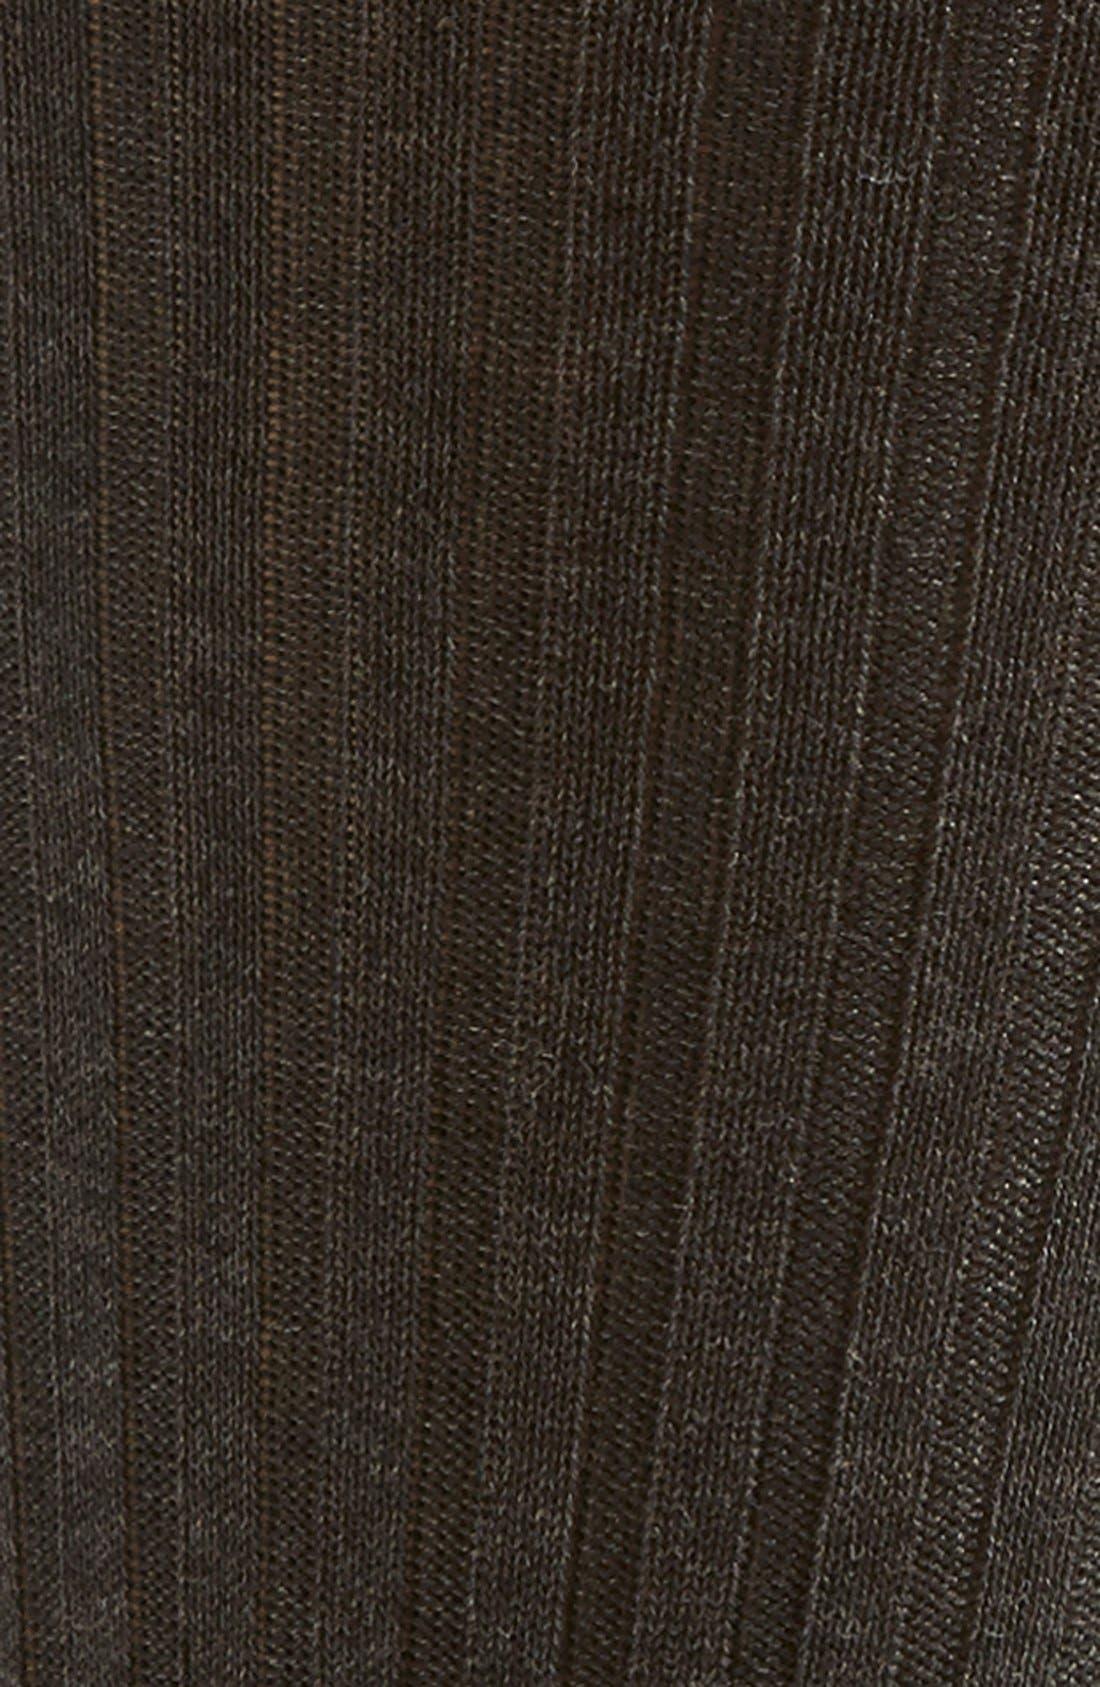 PANTHERELLA, Cotton Blend Mid Calf Dress Socks, Alternate thumbnail 2, color, DARK GREY 08